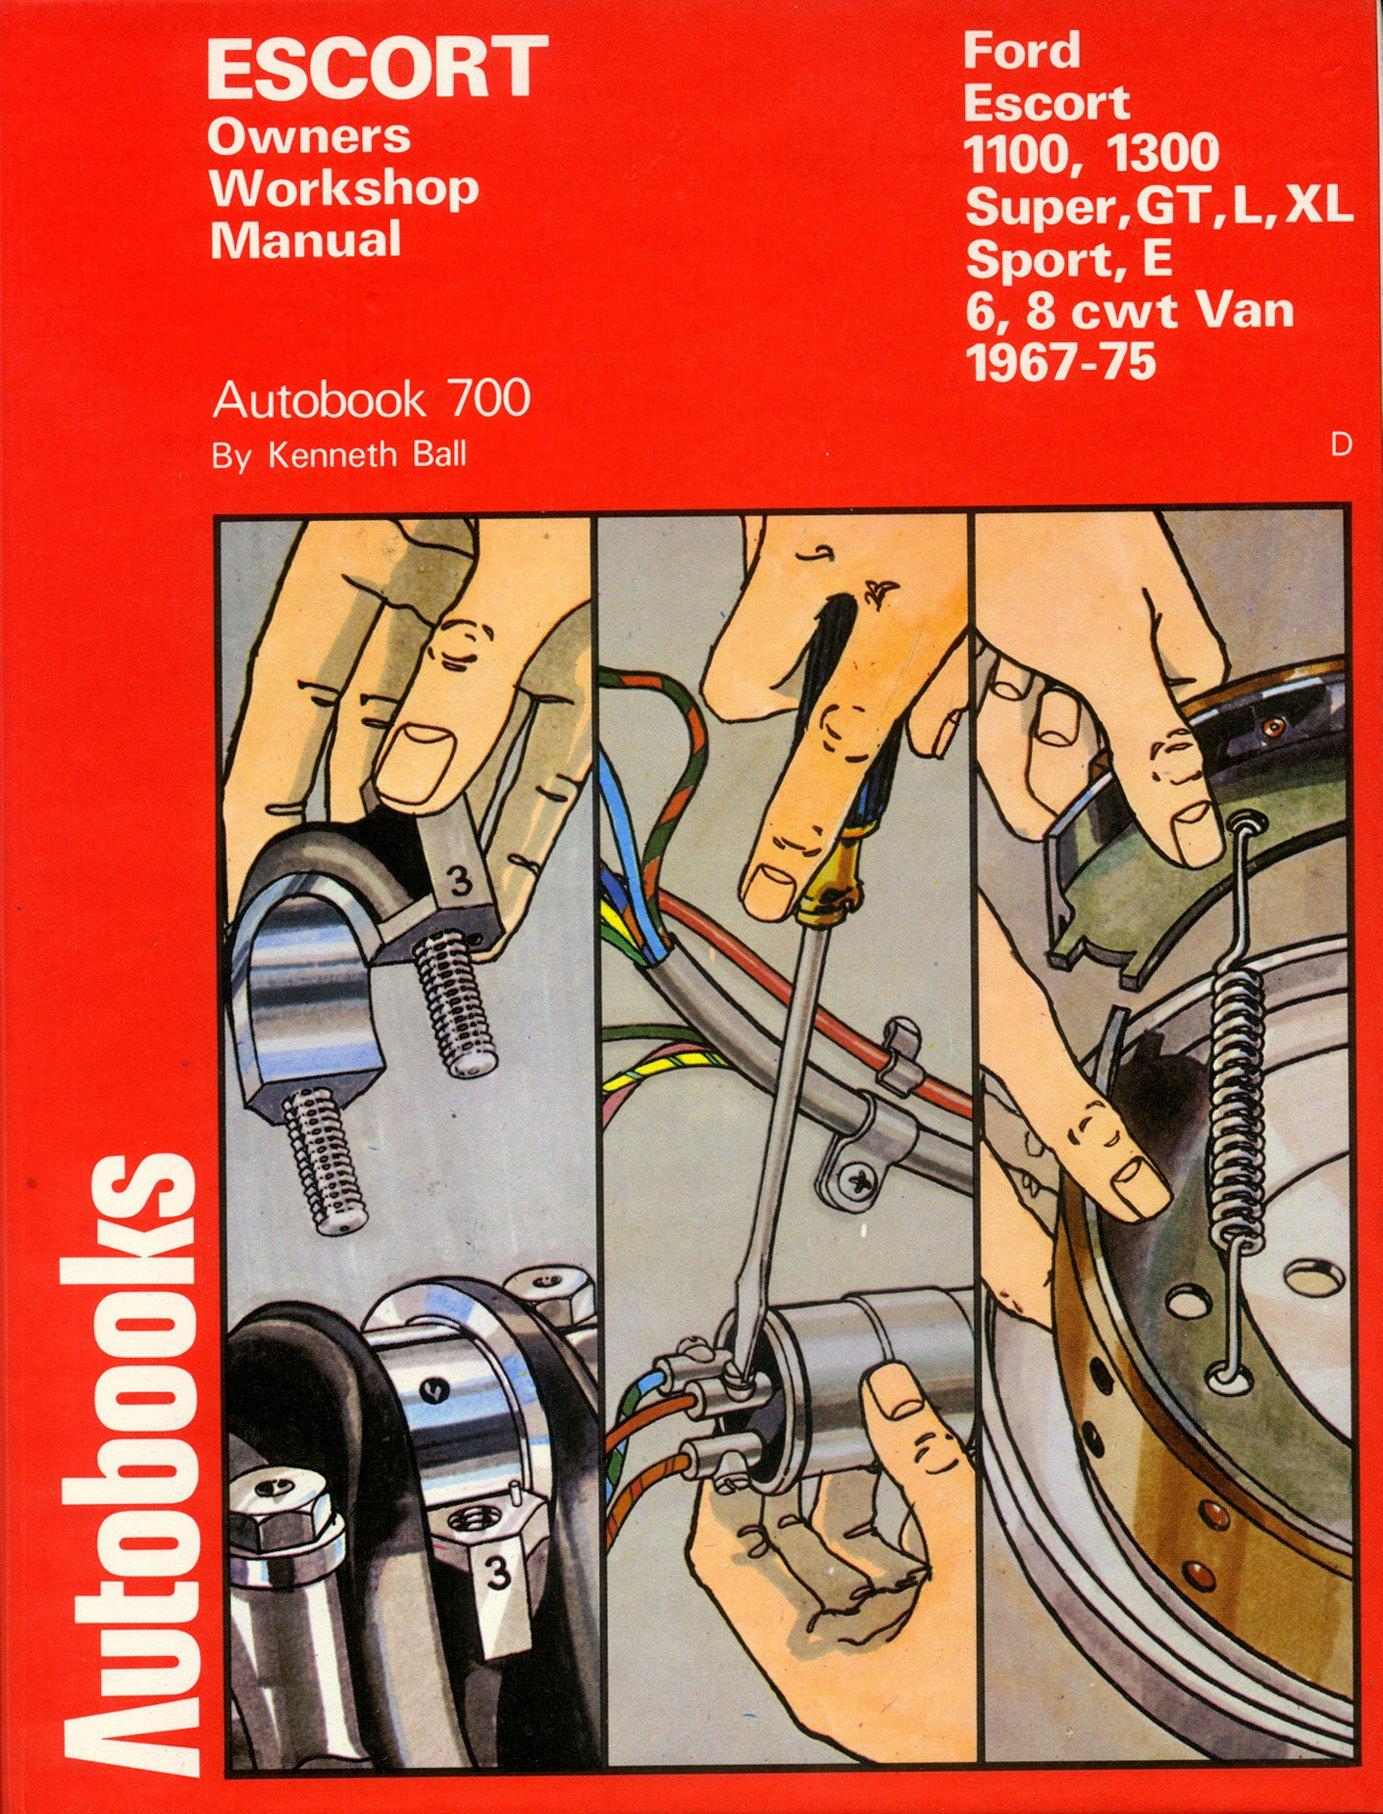 Ford Escort 1967-75 Autobook: Kenneth Ball: 9780851475554: Amazon.com: Books